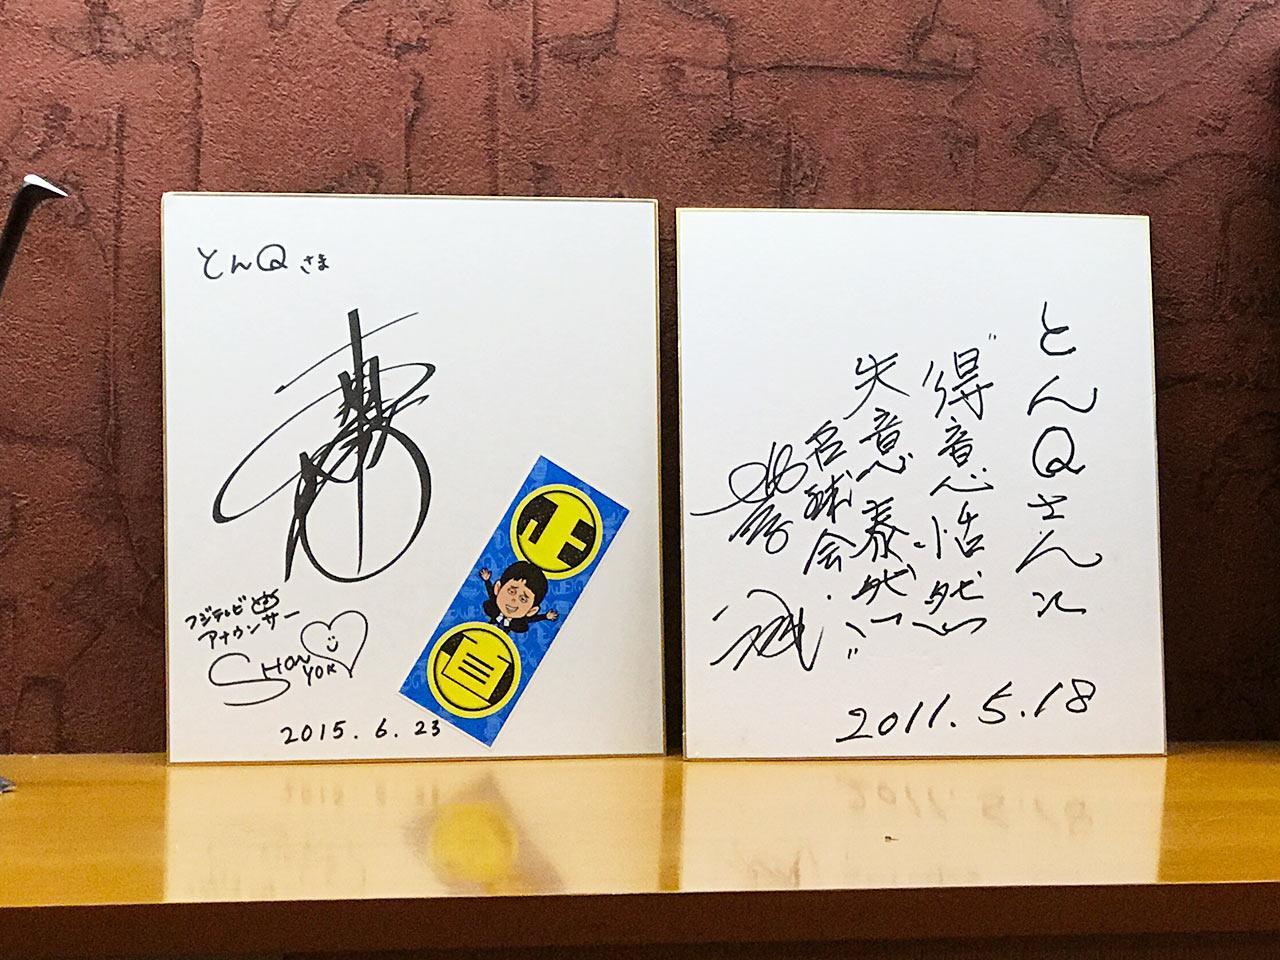 kawasaki-ton-q-sign